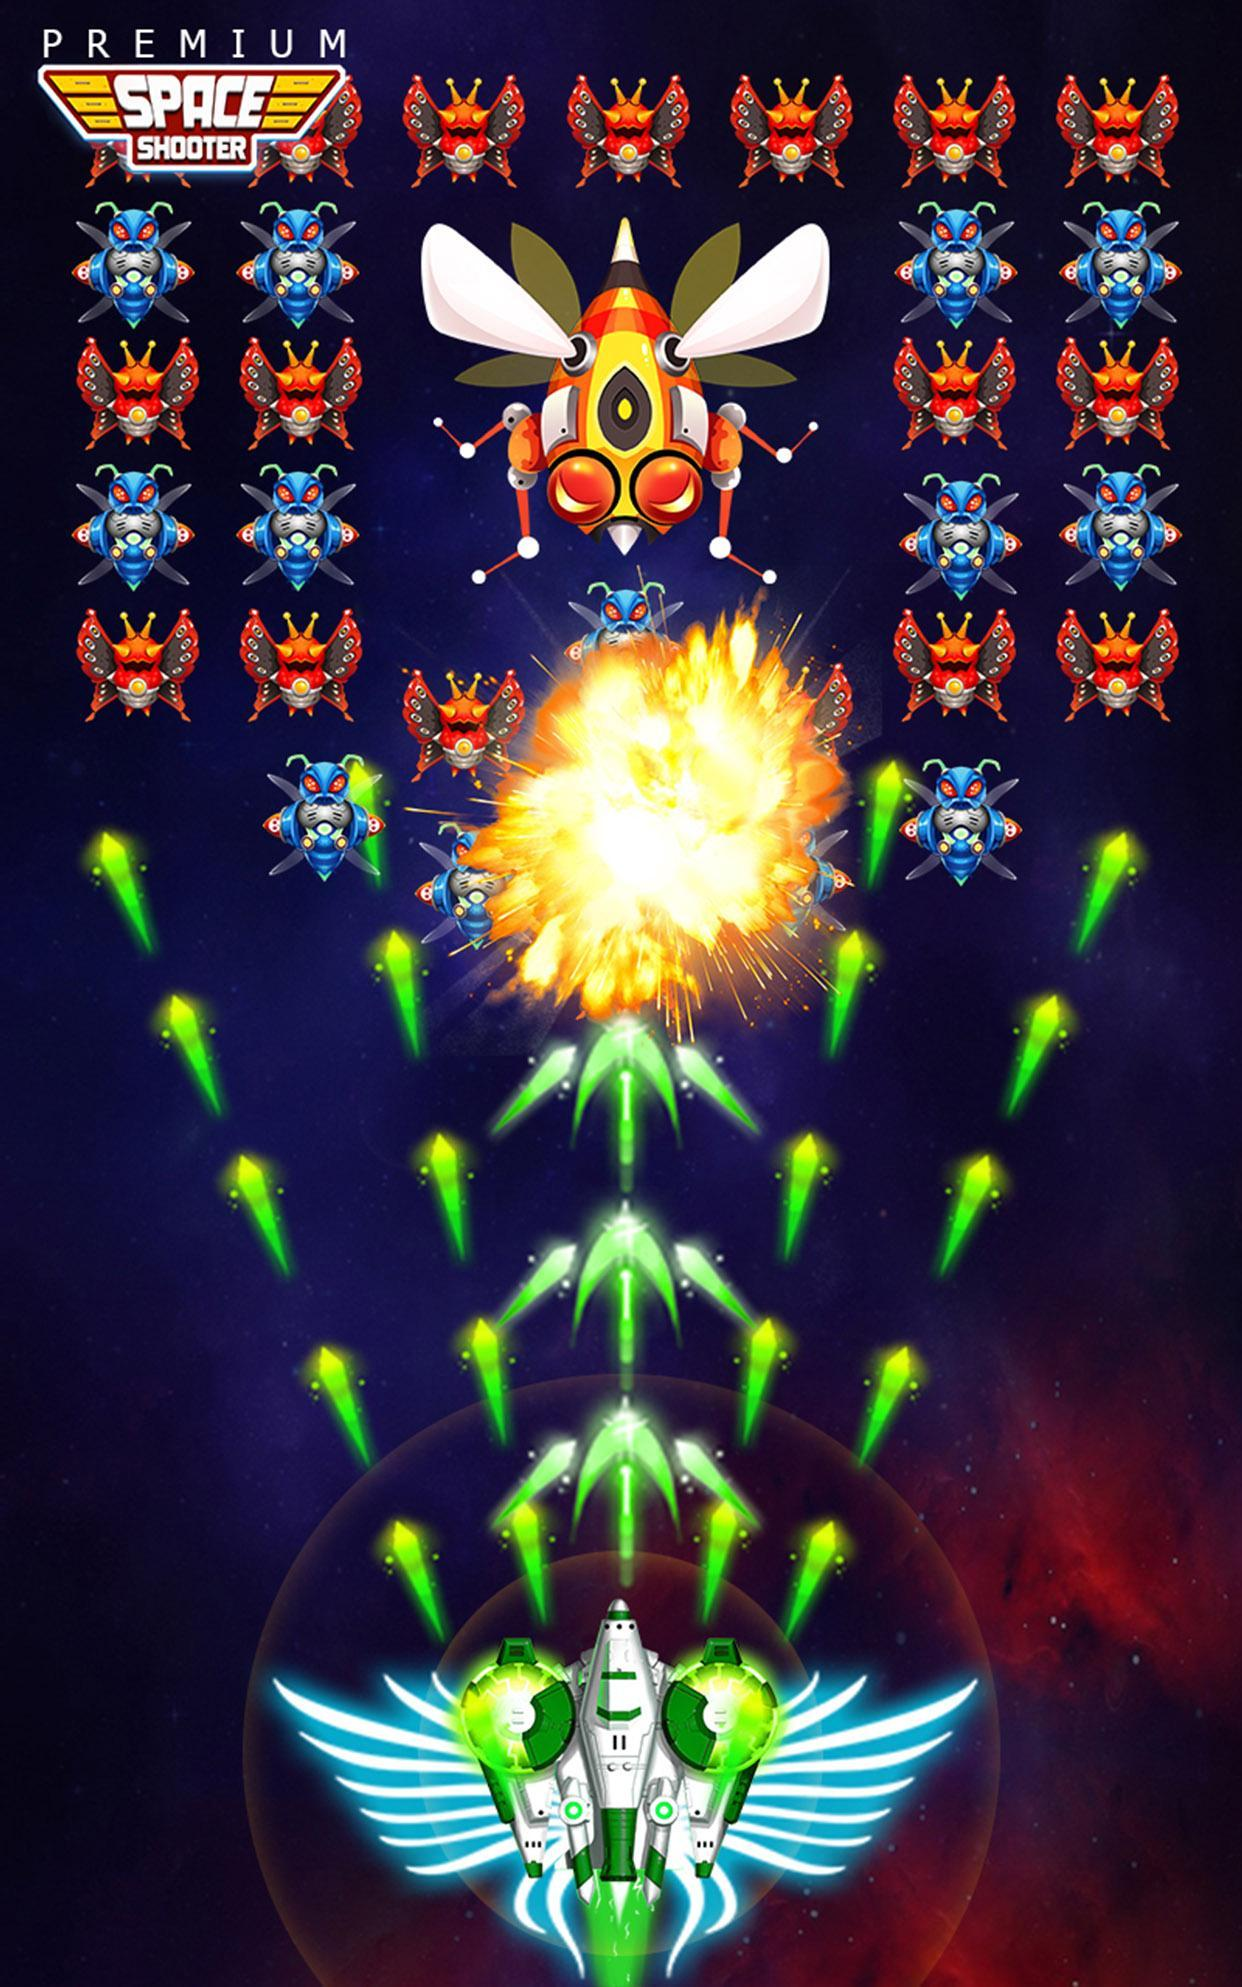 Space Shooter: Alien vs Galaxy Attack (Premium) 1.434 Screenshot 13